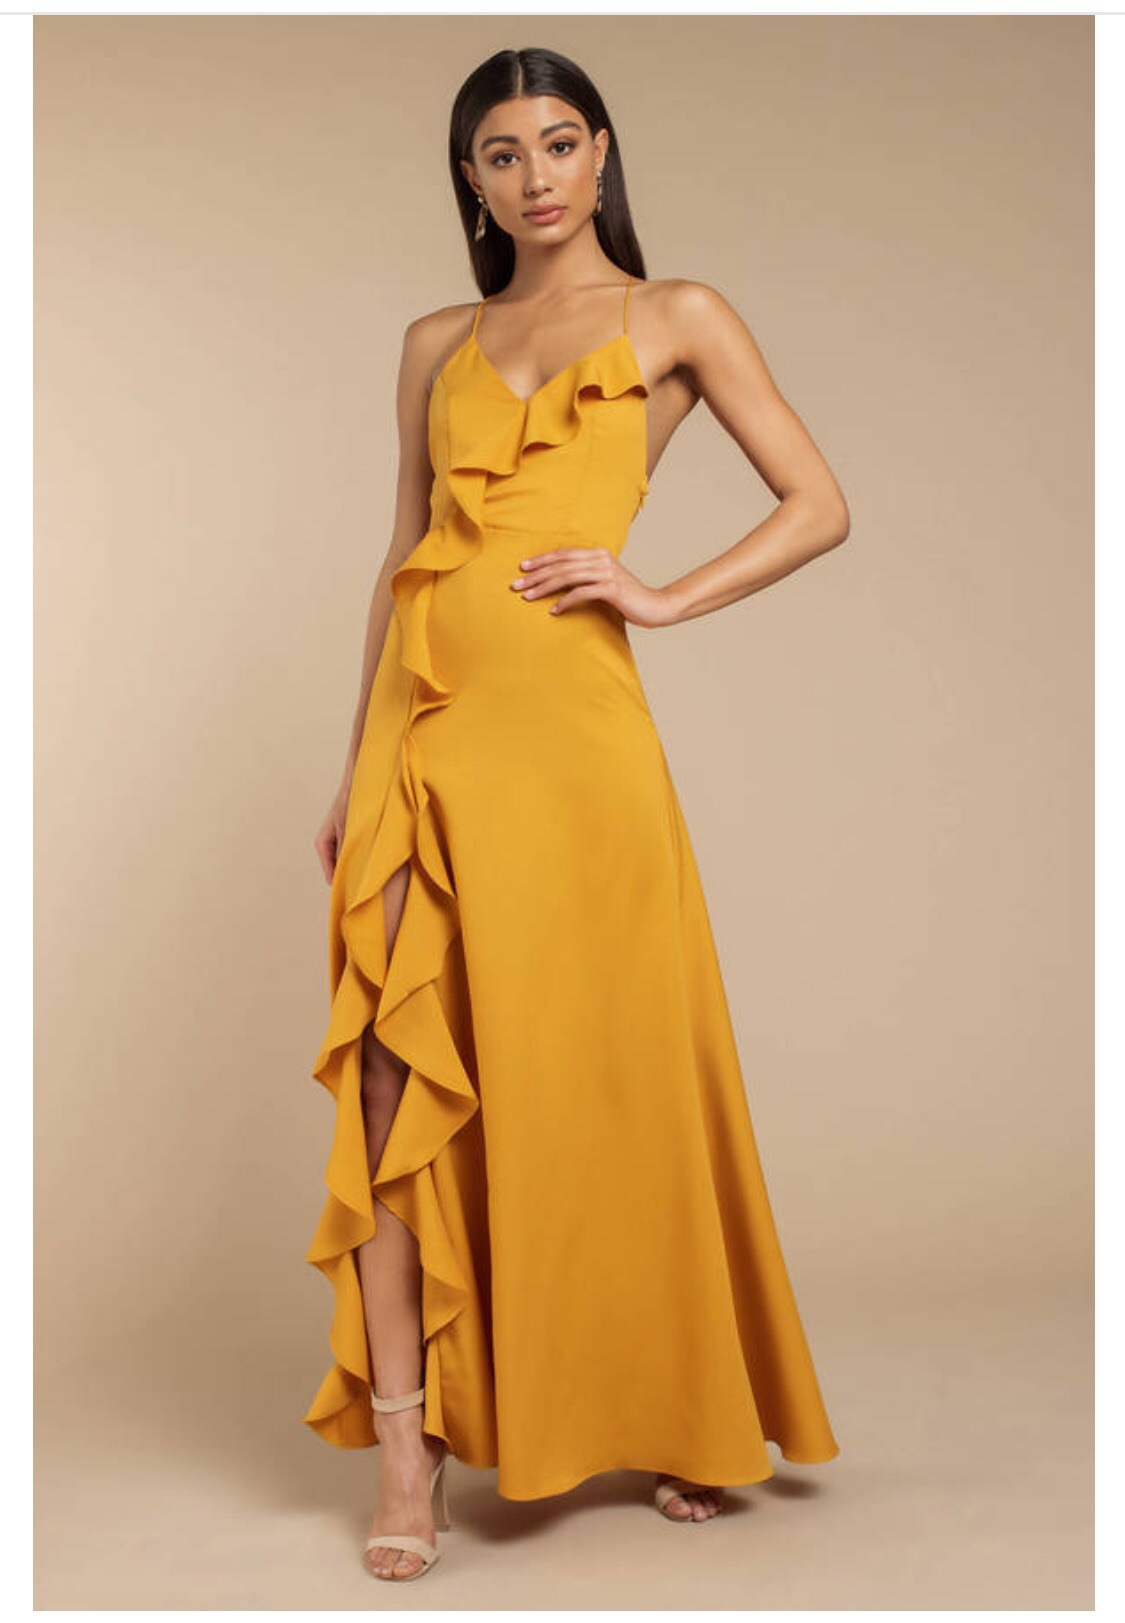 dress yellow maxi dress maxi prom dress prom v neck dress v neck strappy yellow dress